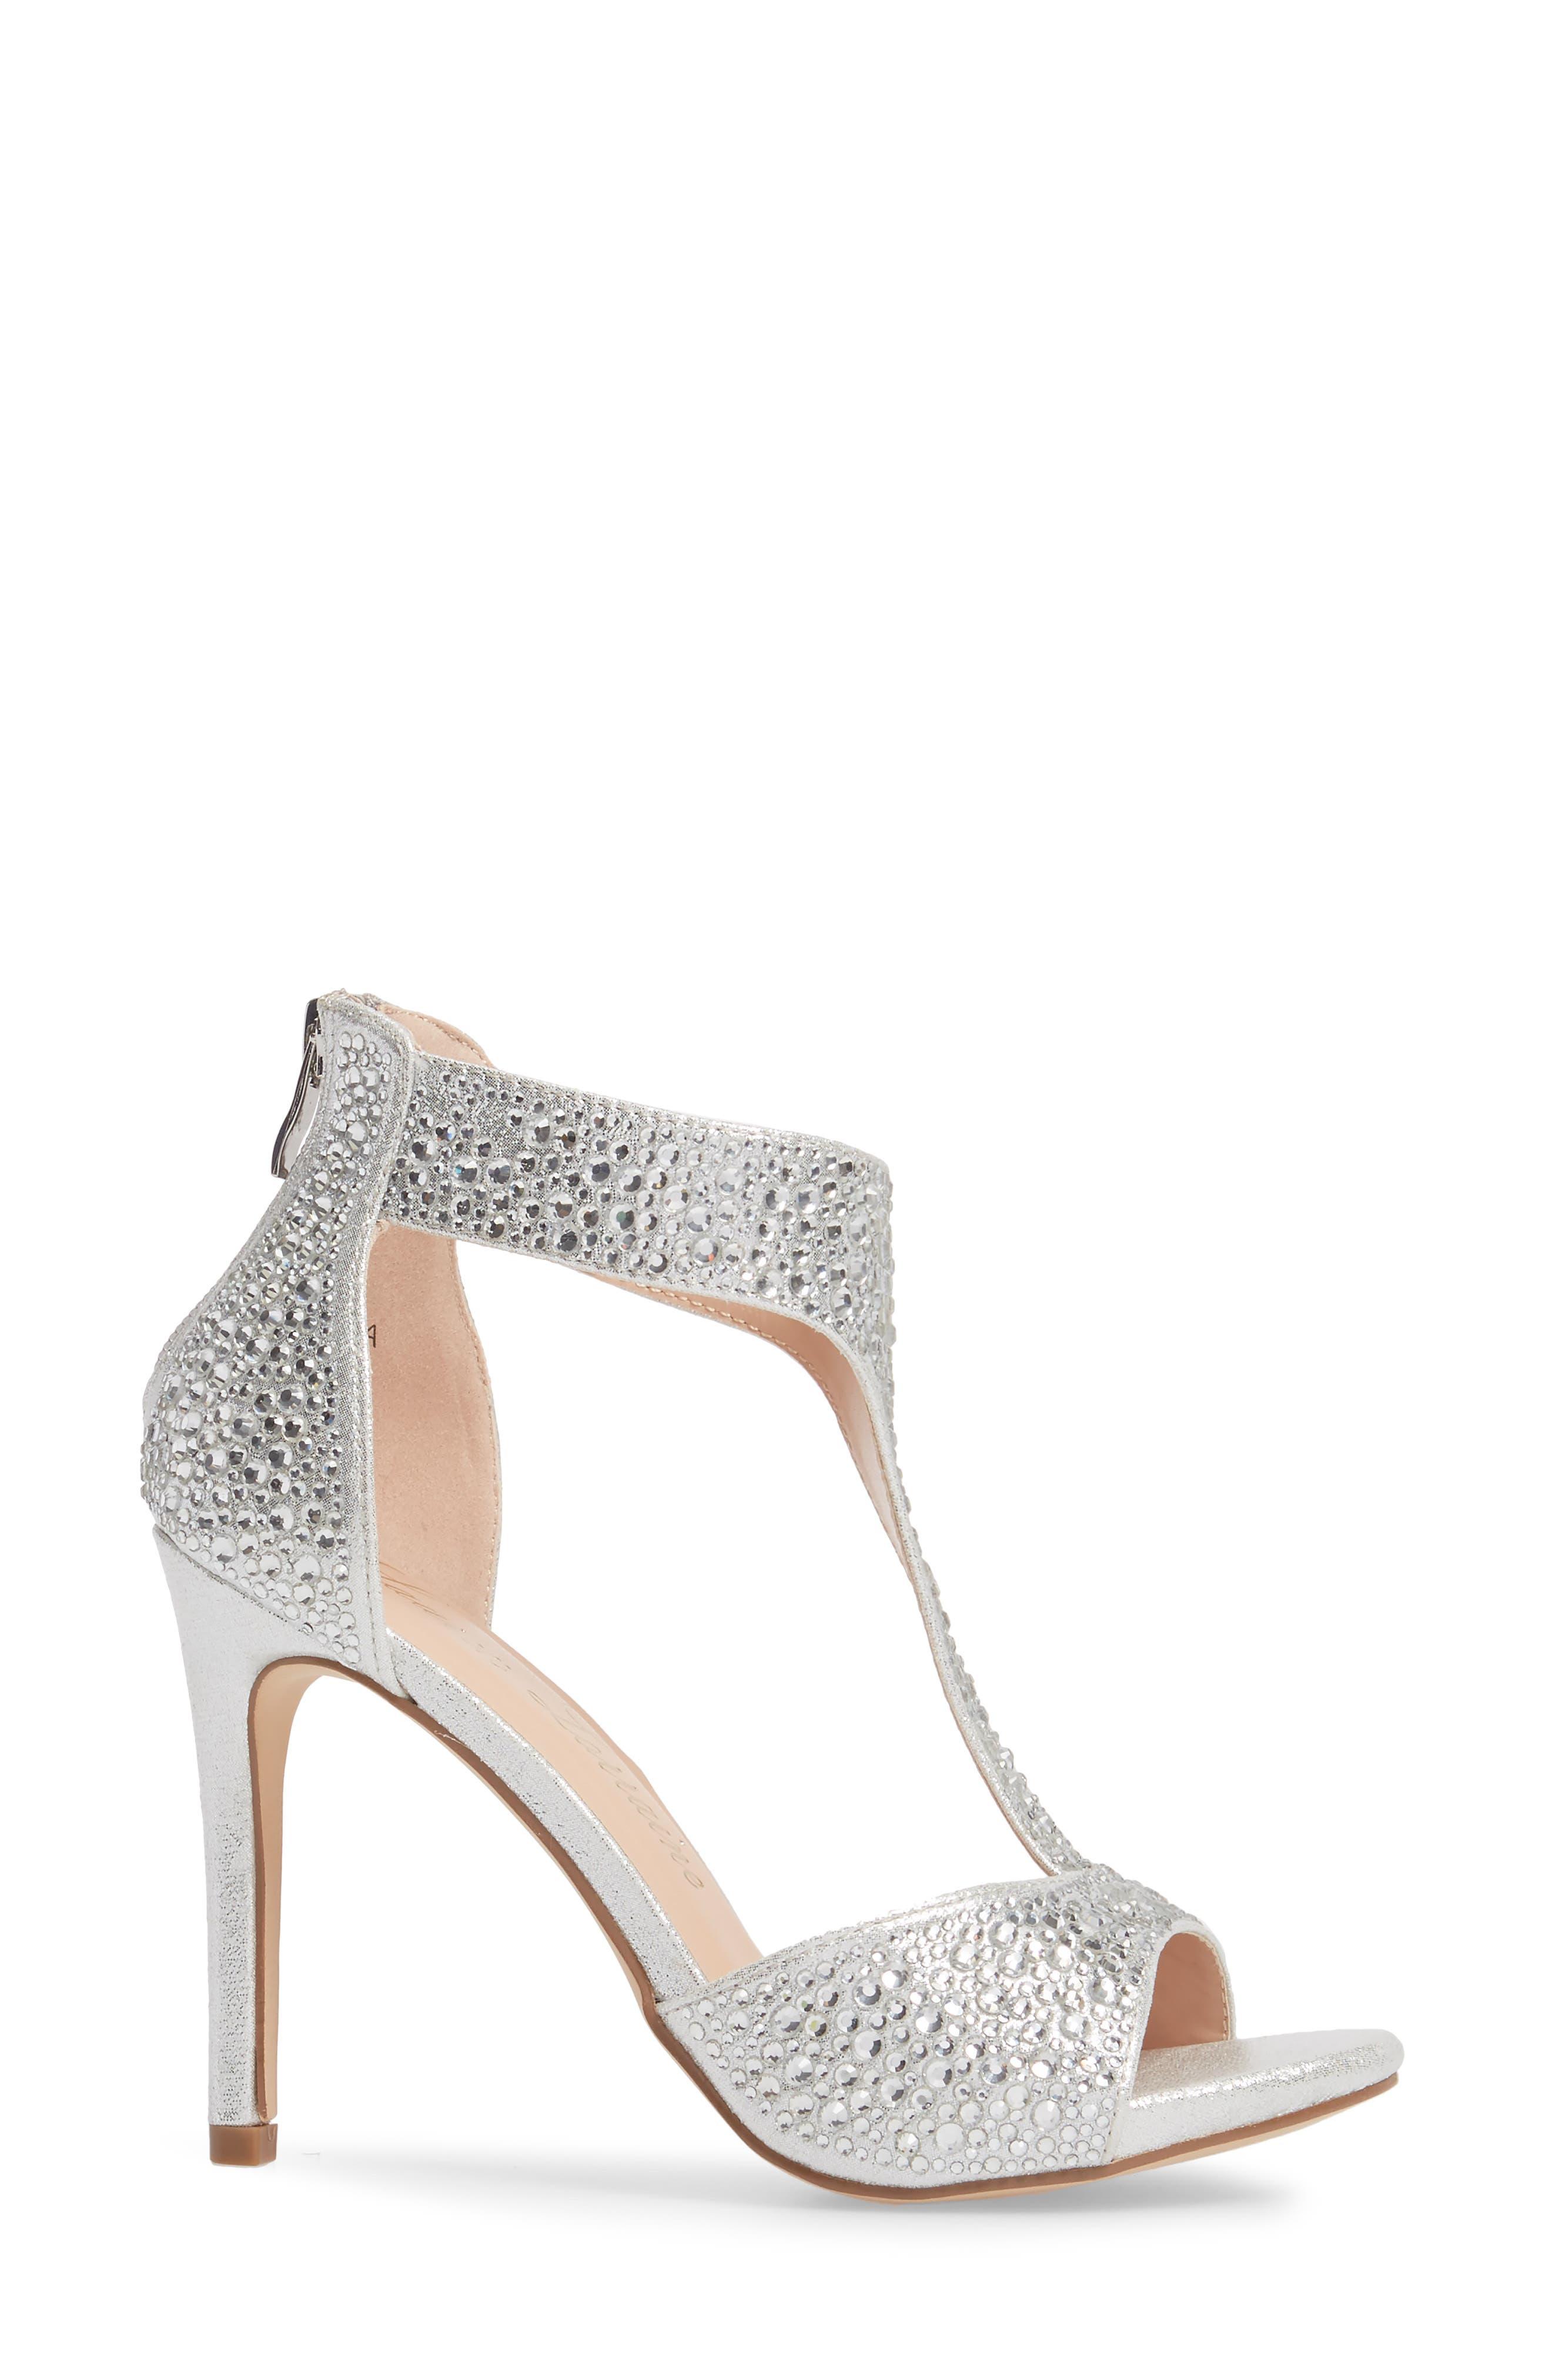 Ina Crystal Embellished Sandal,                             Alternate thumbnail 3, color,                             Silver